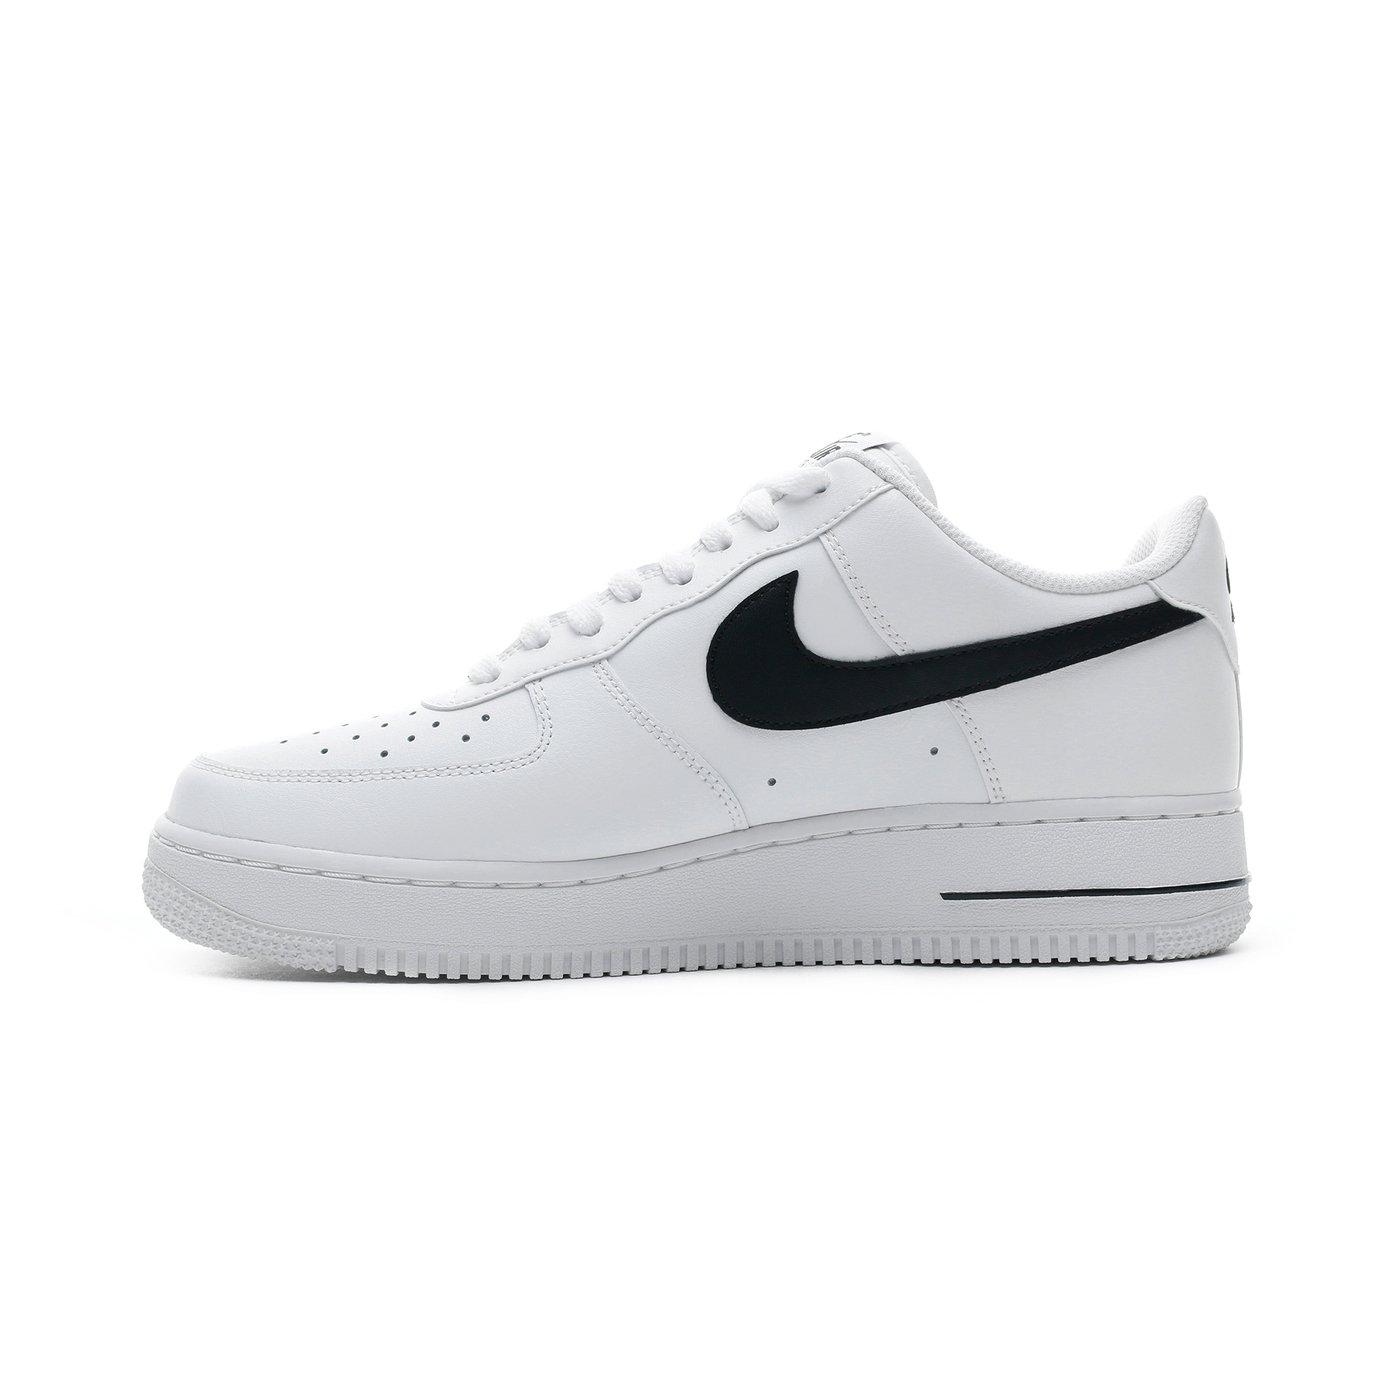 Posada binario tienda de comestibles  Nike Air Force 1 '07 An20 Beyaz Erkek Spor Ayakkabı Erkek Spor Ayakkabı &  Sneaker 3499668 | SuperStep